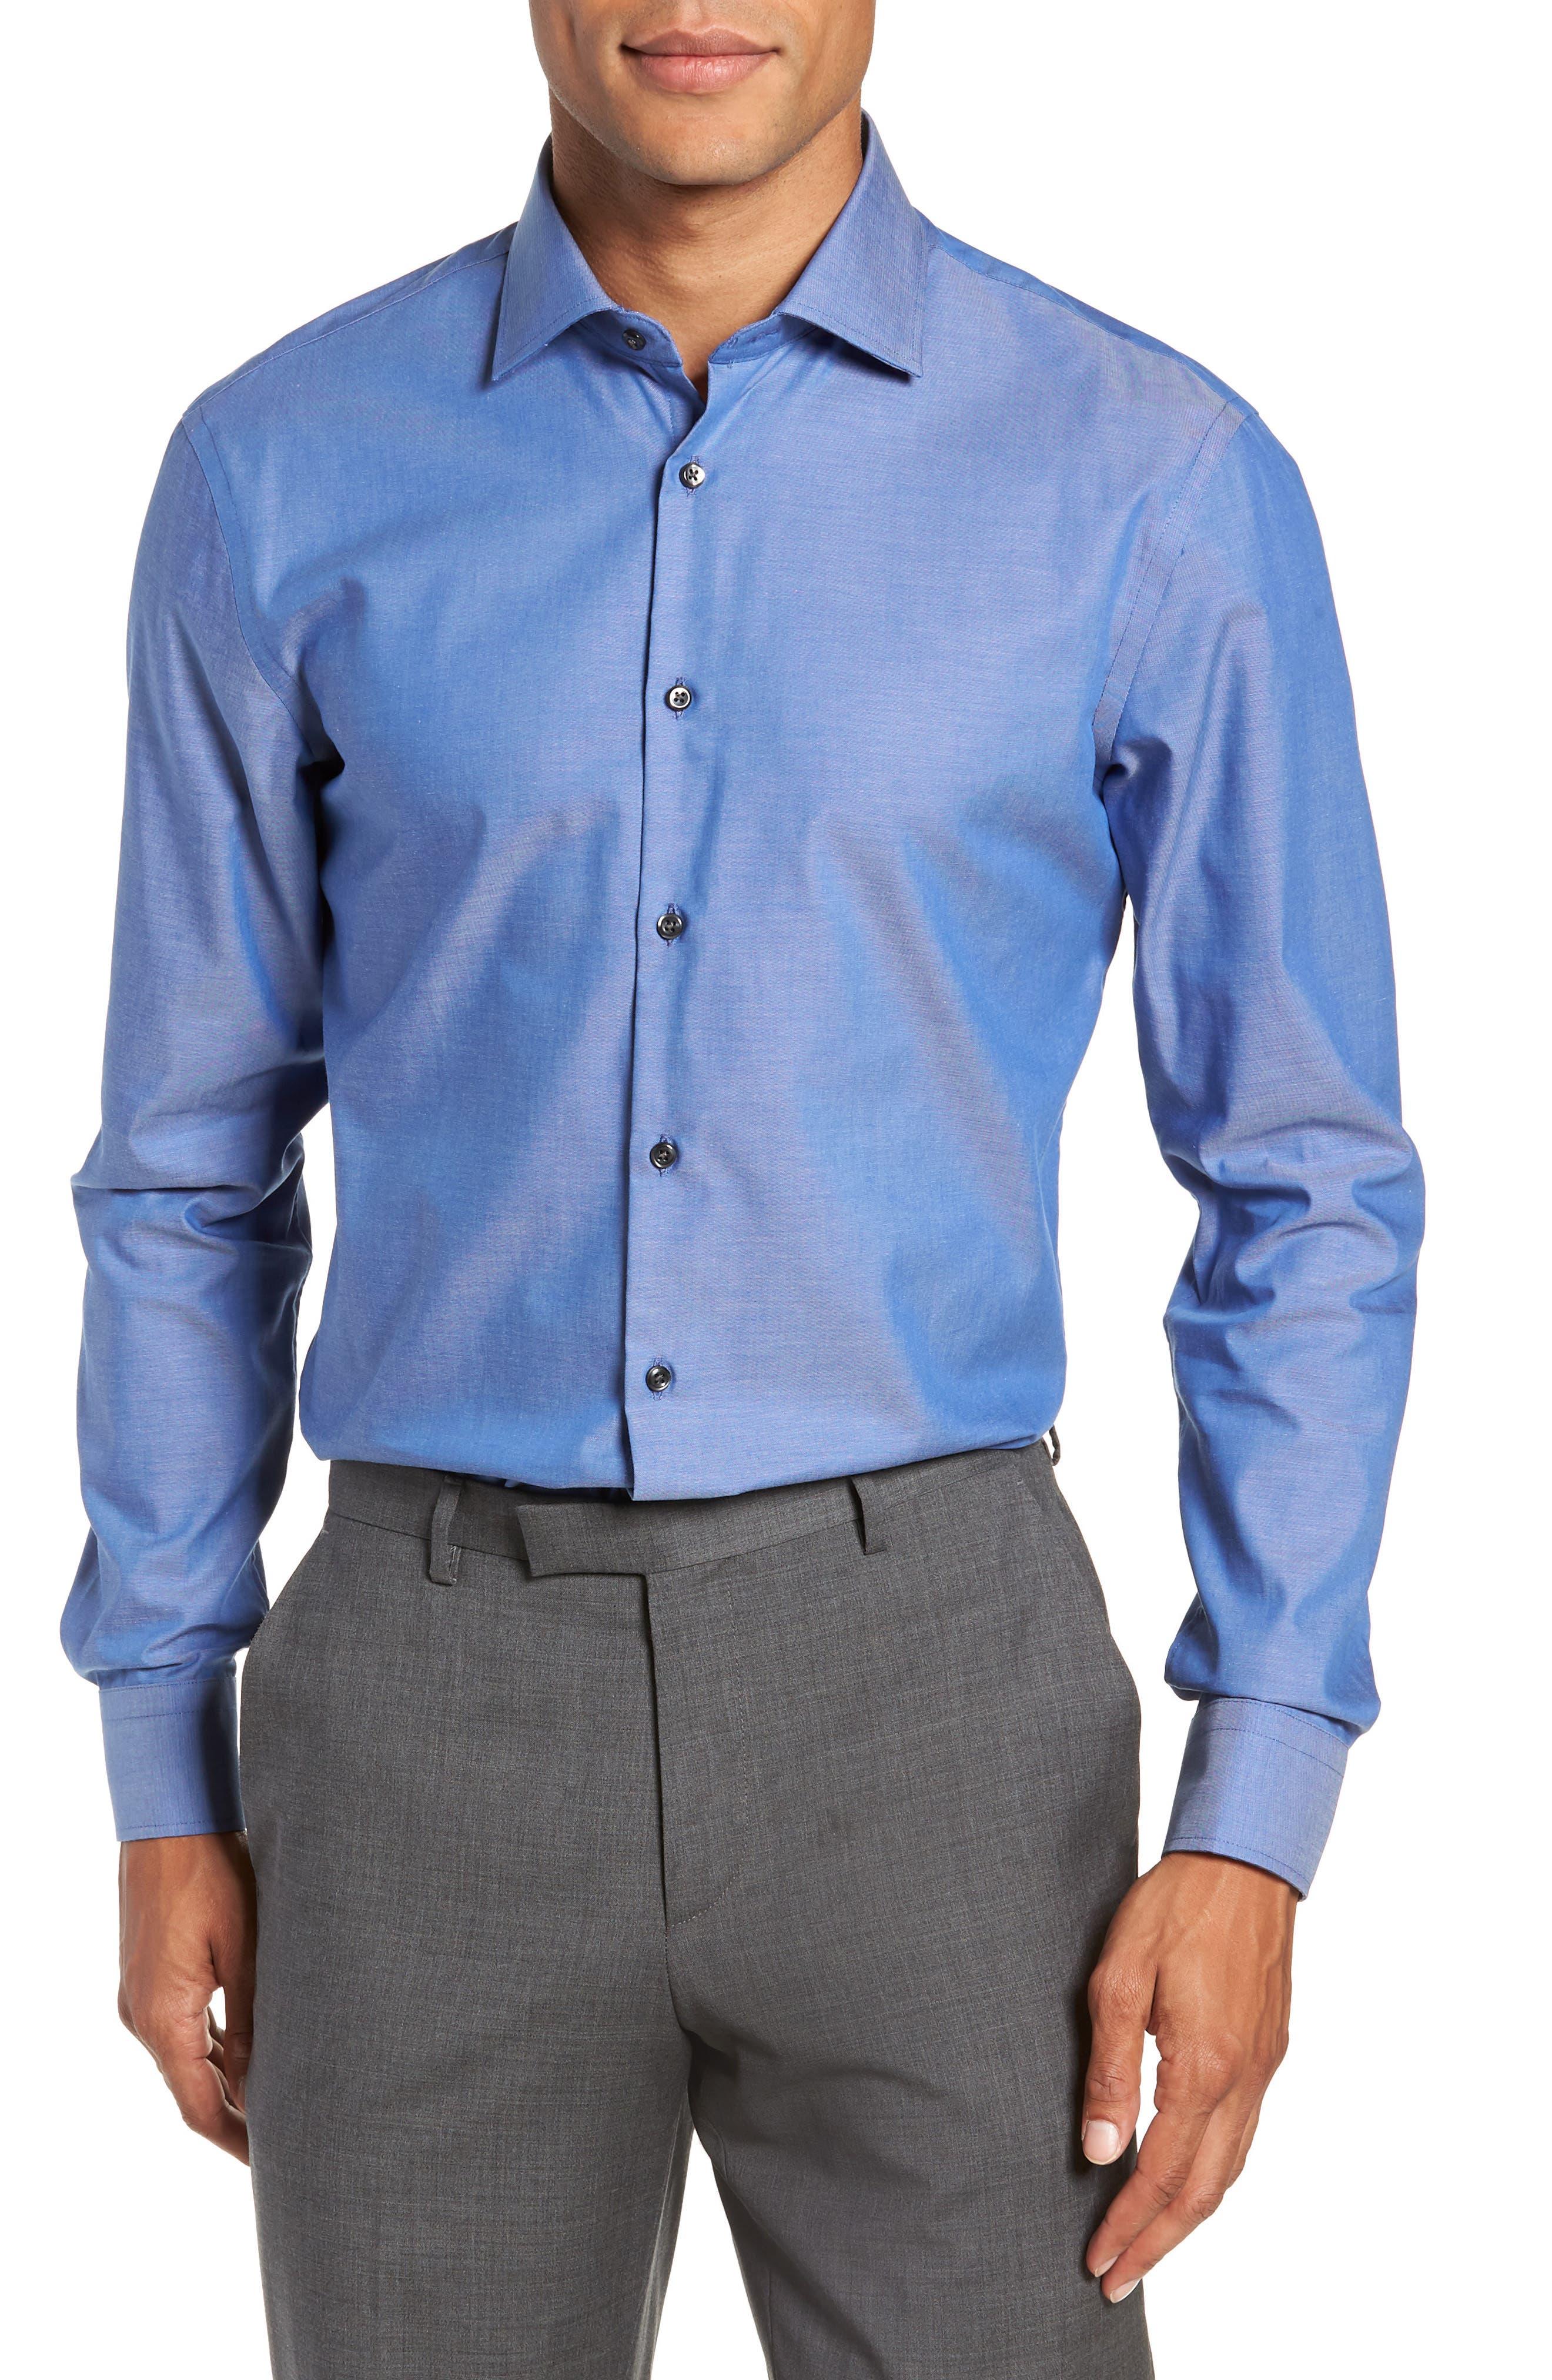 Extra Trim Fit Non-Iron Solid Dress Shirt,                             Main thumbnail 1, color,                             BLUE DENIM